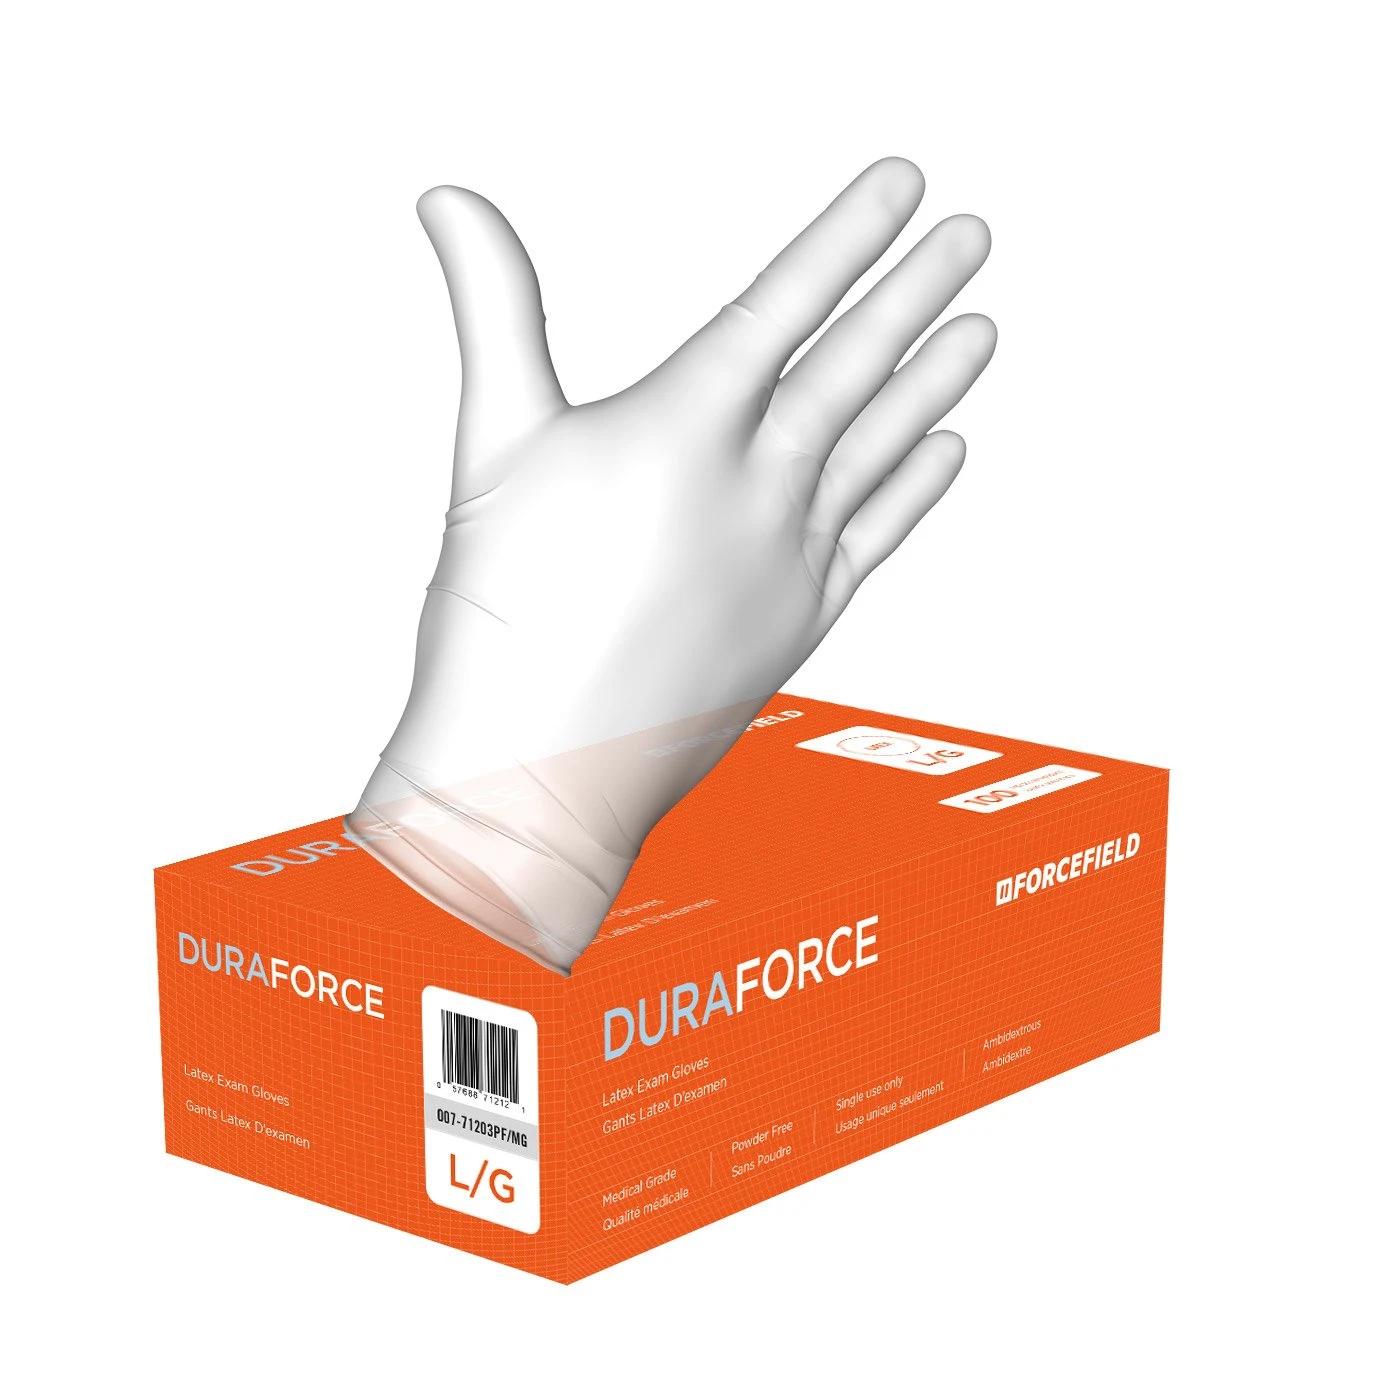 Duraforce Duraforce - White Latex Exam Gloves